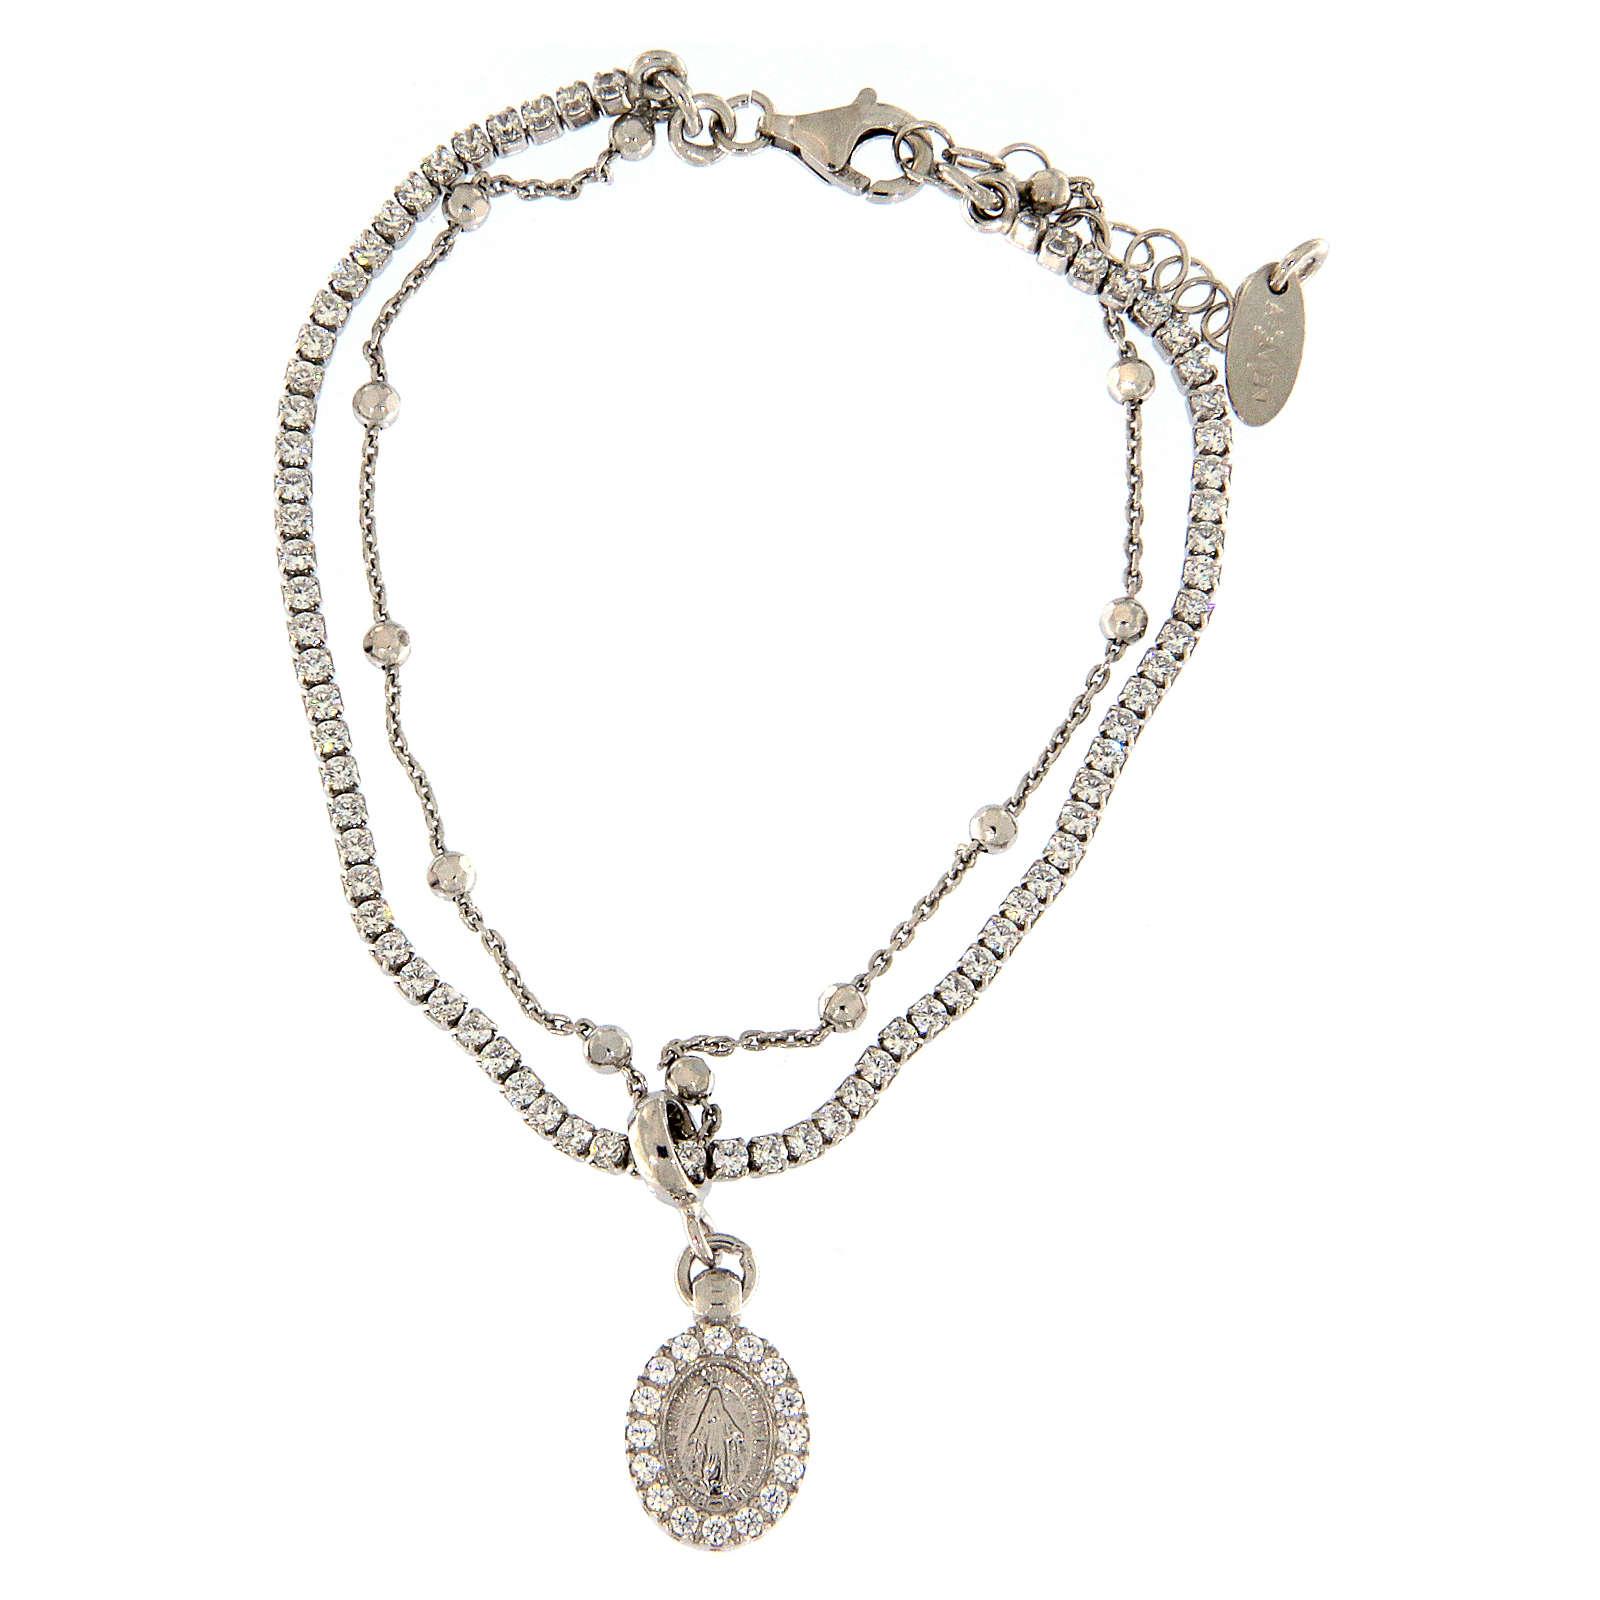 Pulseira AMEN prata 925 rodiada zircões brancos Medalha Milagrosa 4